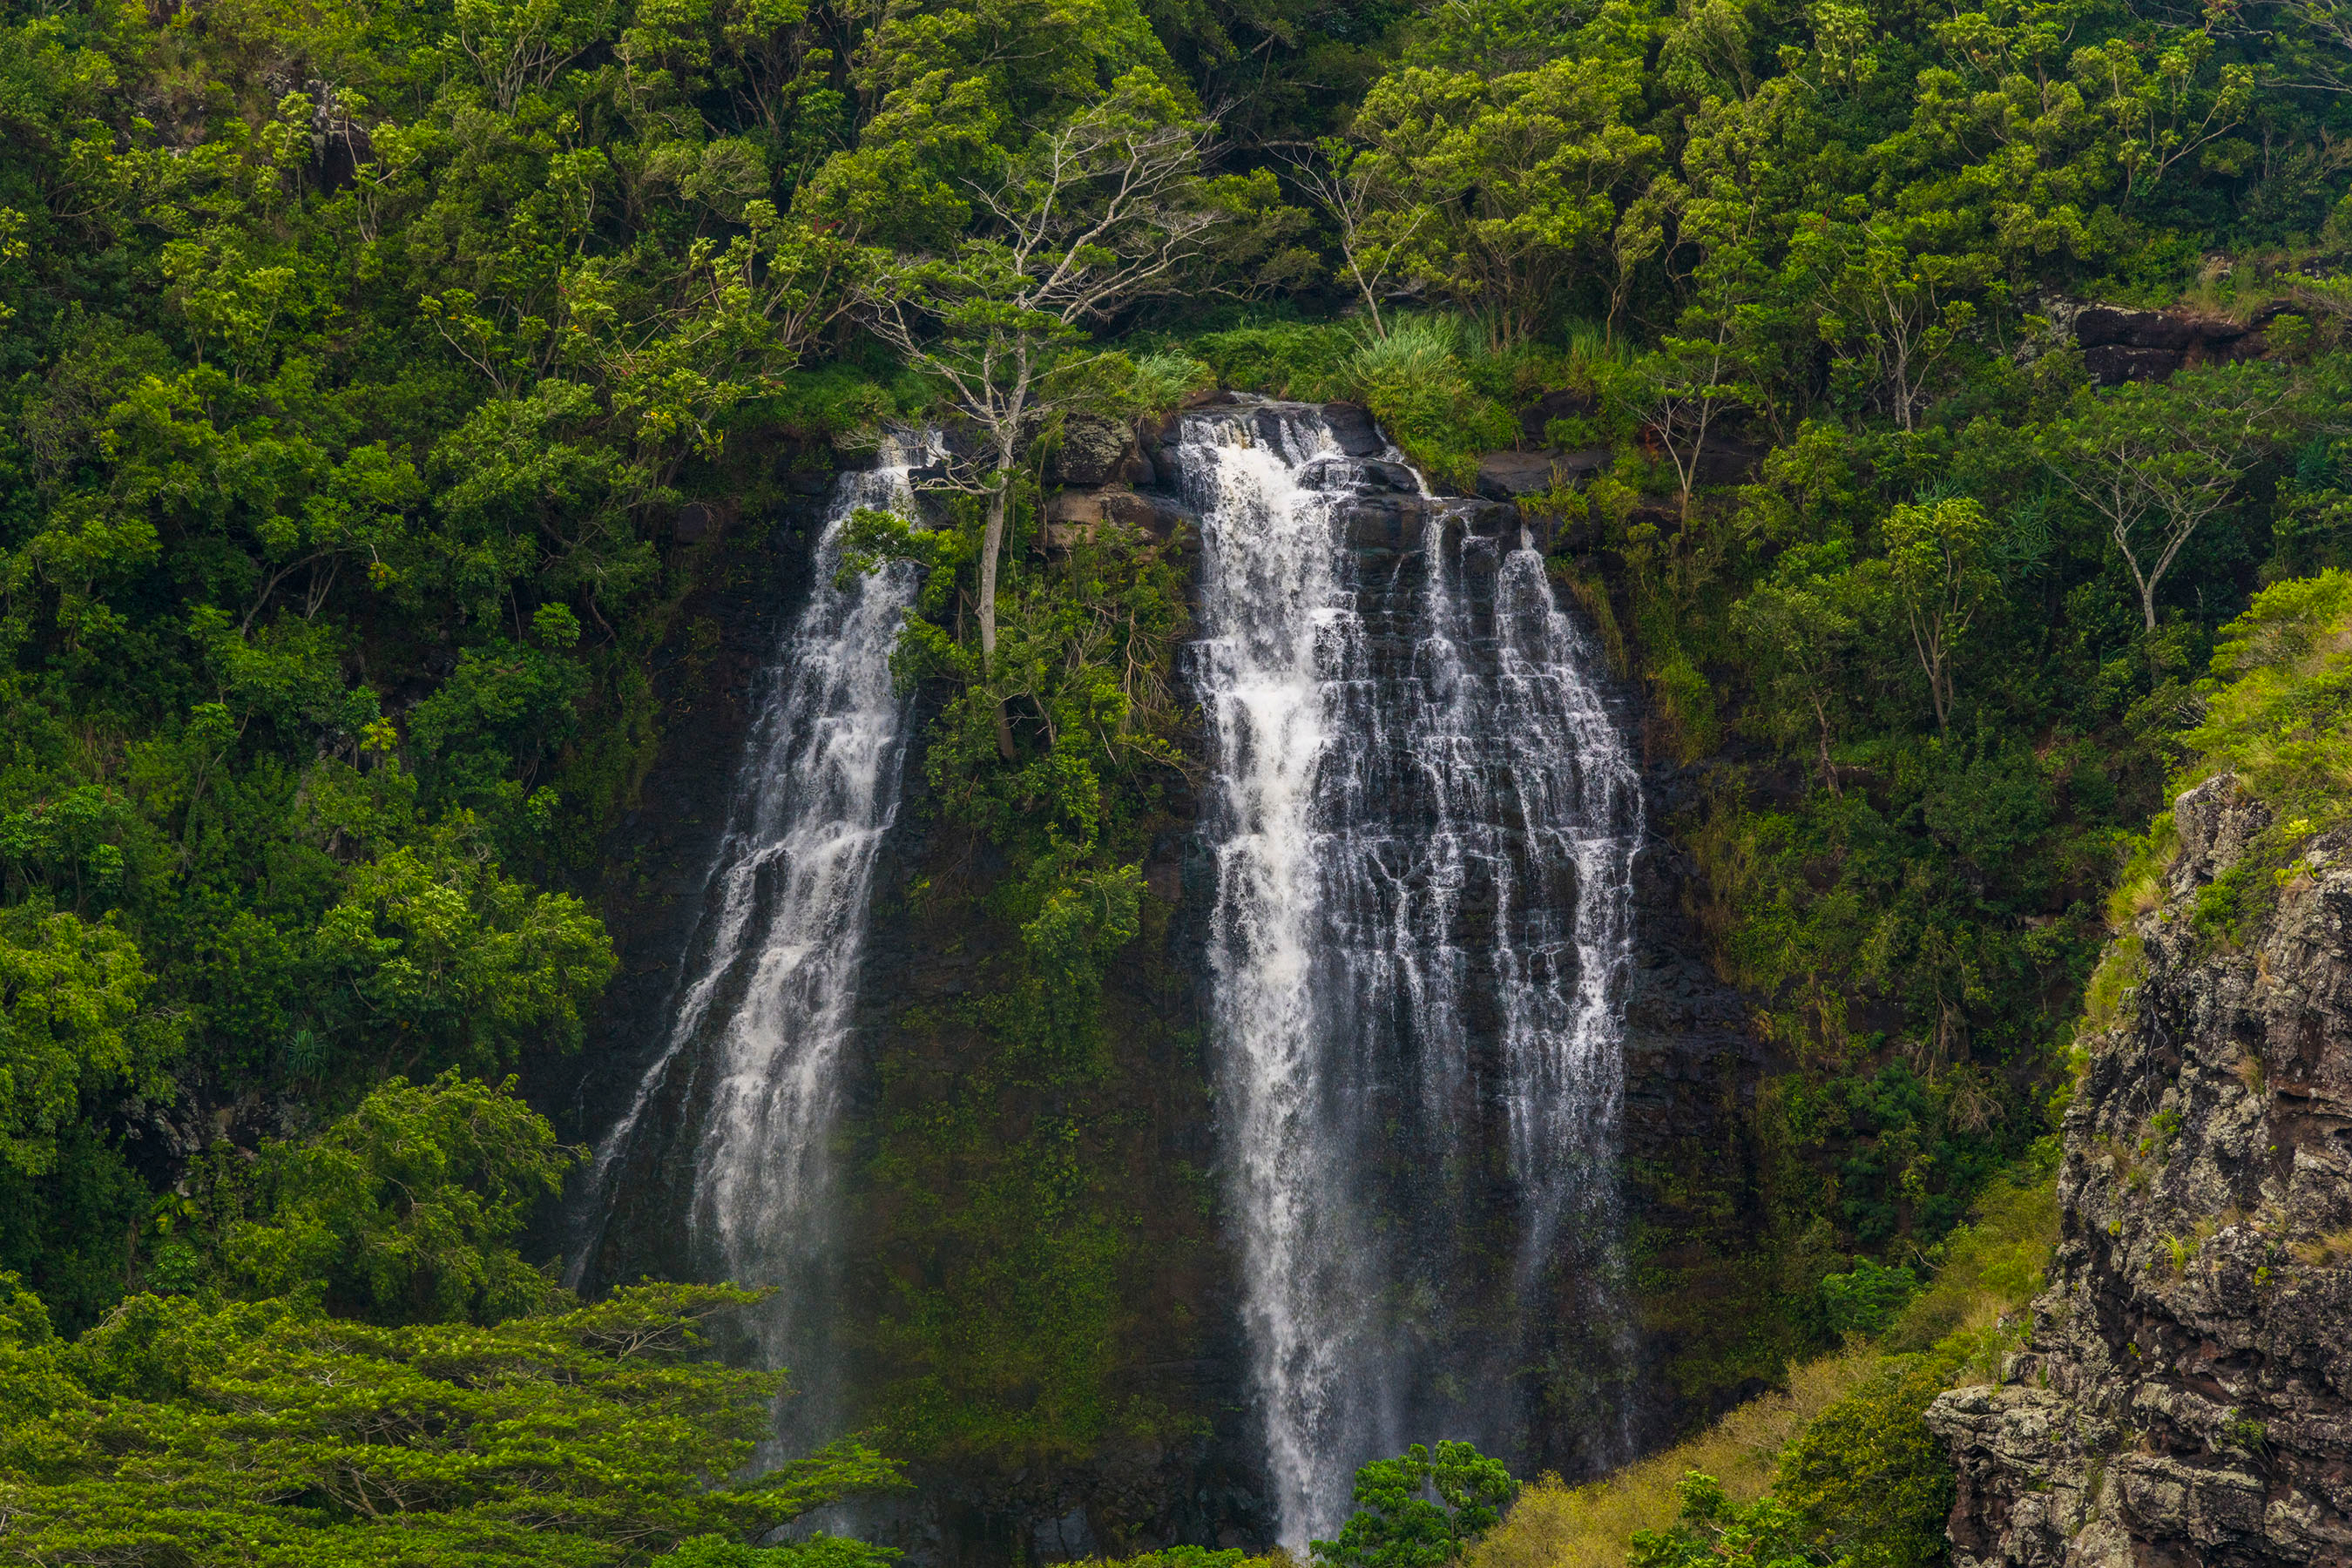 waterfalls | popular waterfalls | nature | outdoors | beautiful waterfalls | less traveled waterfalls | less traveled